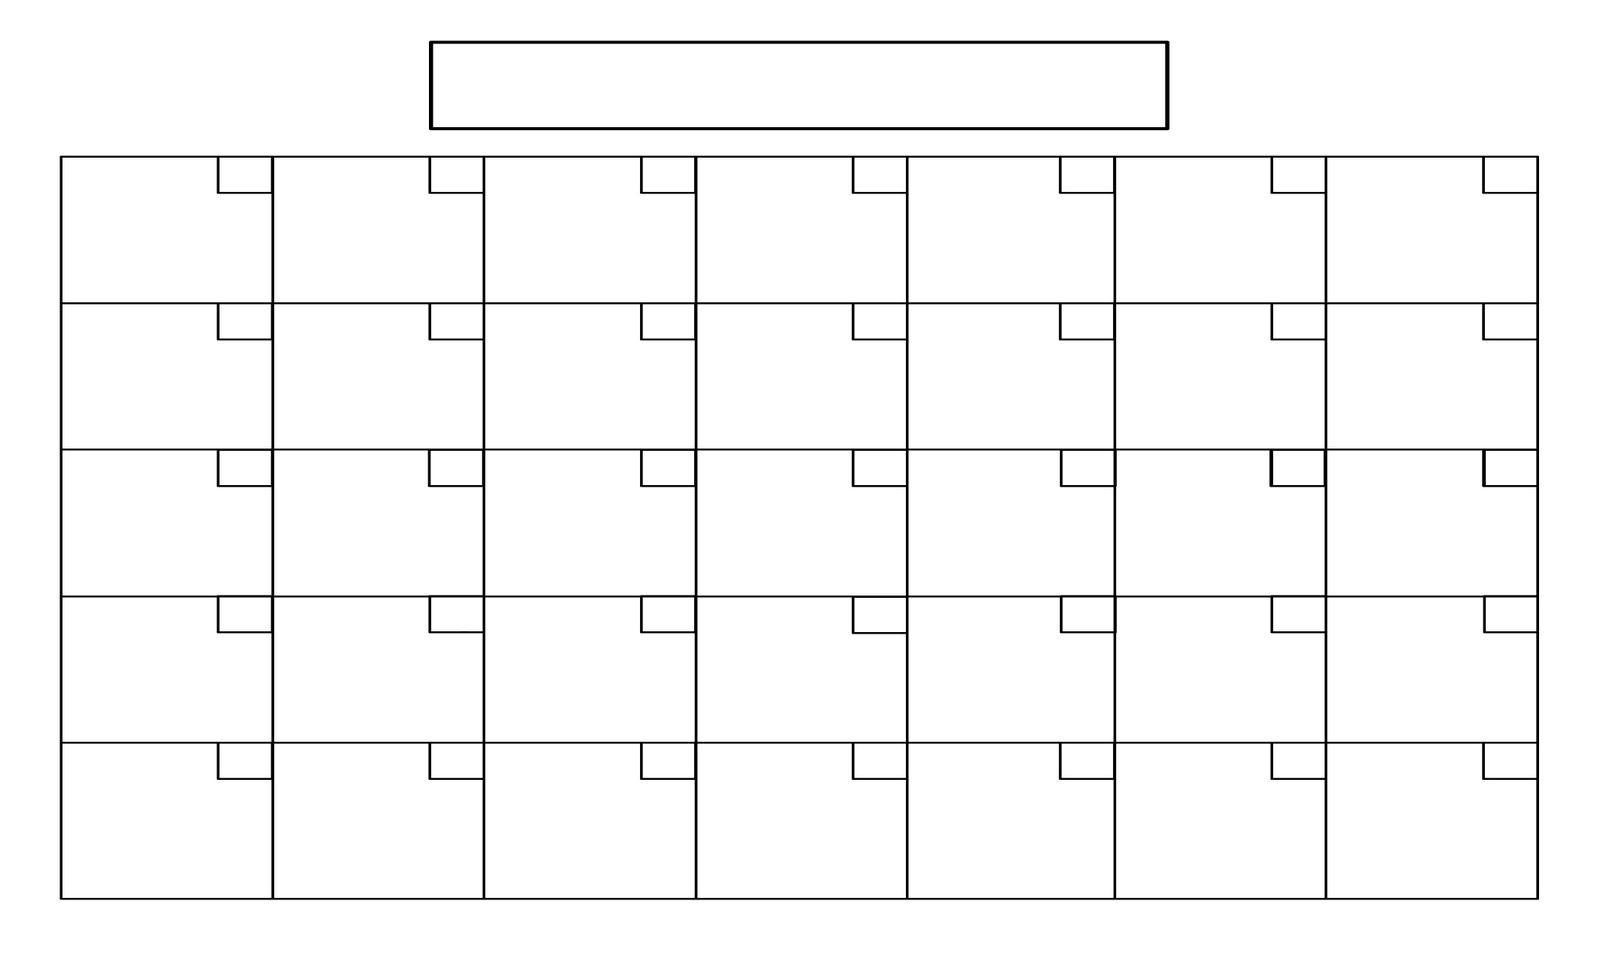 Printable+Full+Page+Blank+Calendar+Template | Boyscout | Blank for 1 Month Calendar Printable Blank